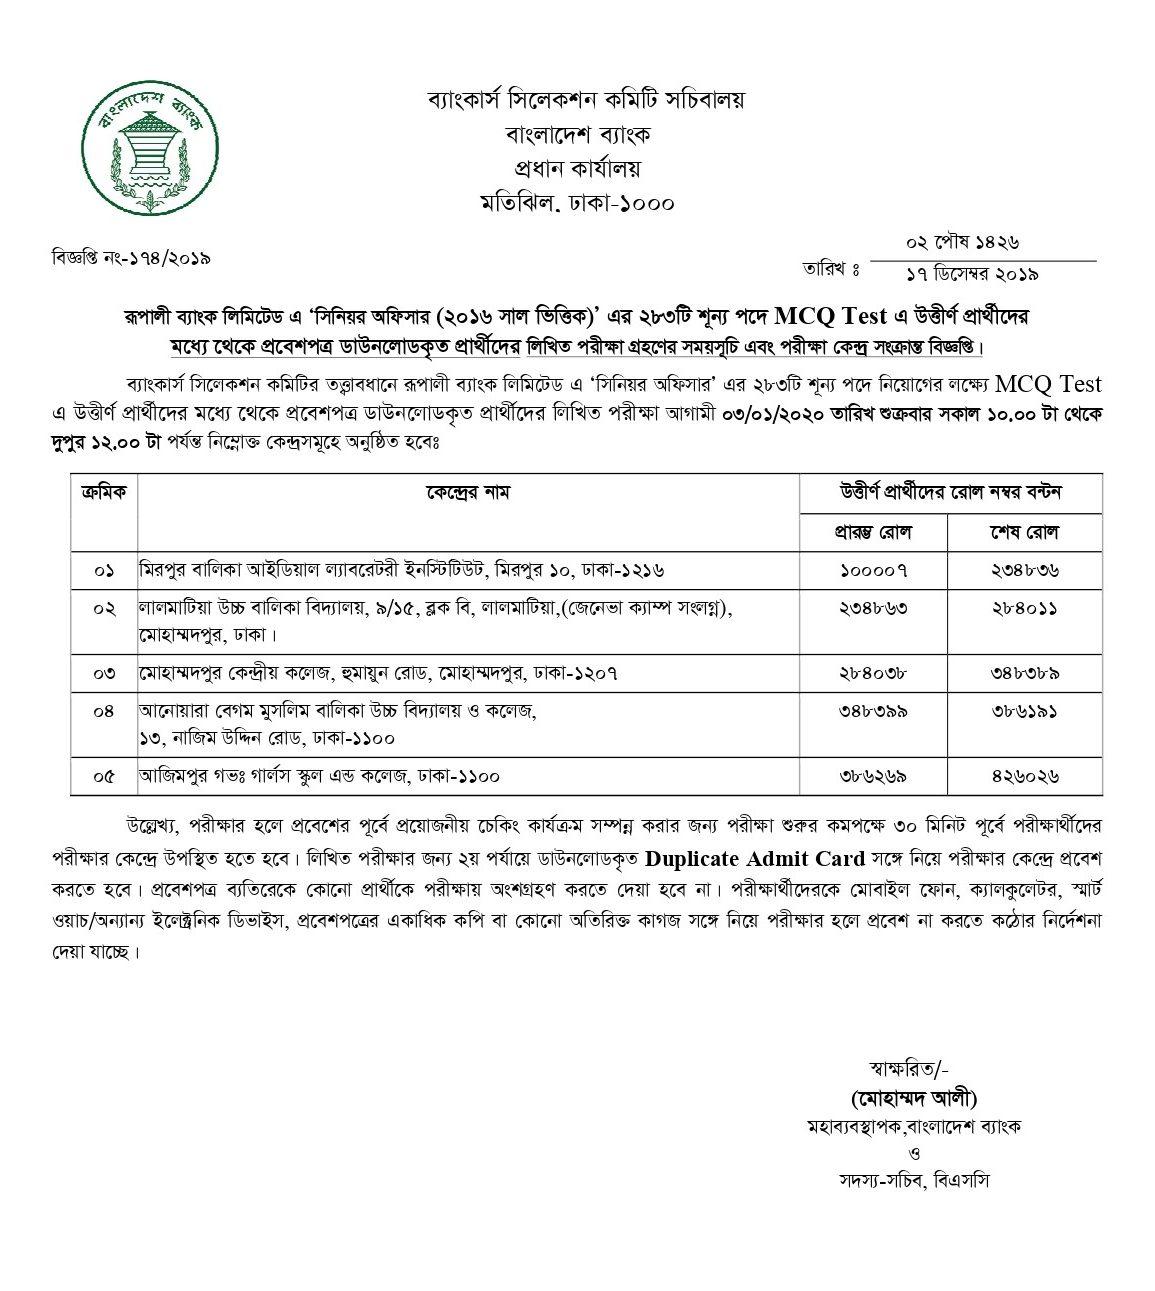 Rupali Bank Senior Exam Result 2019 PDF